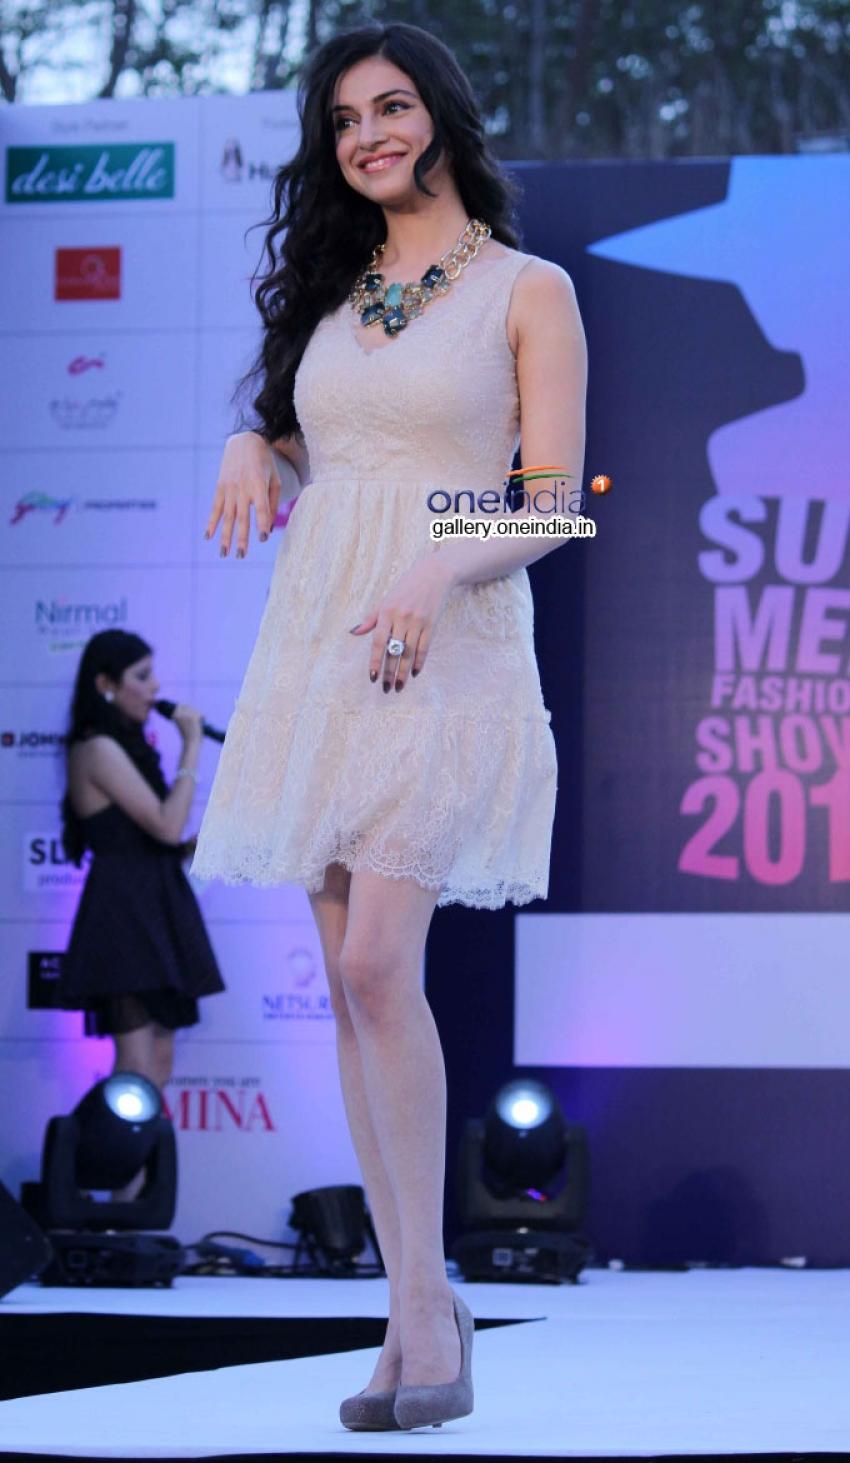 Femina Showcase Event at Inorbit Mall Photos